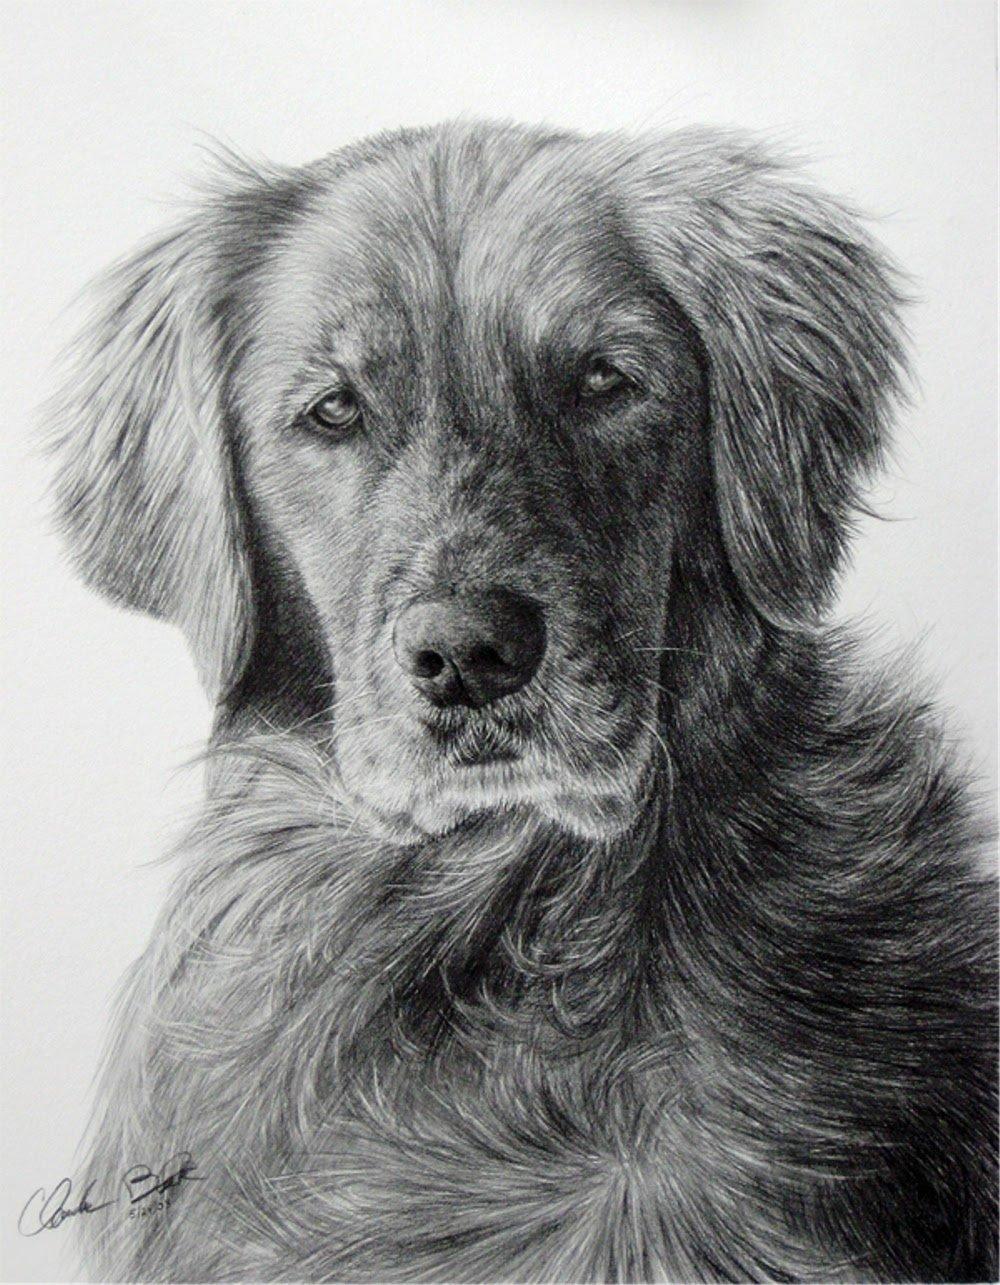 фото картинок животных карандашом